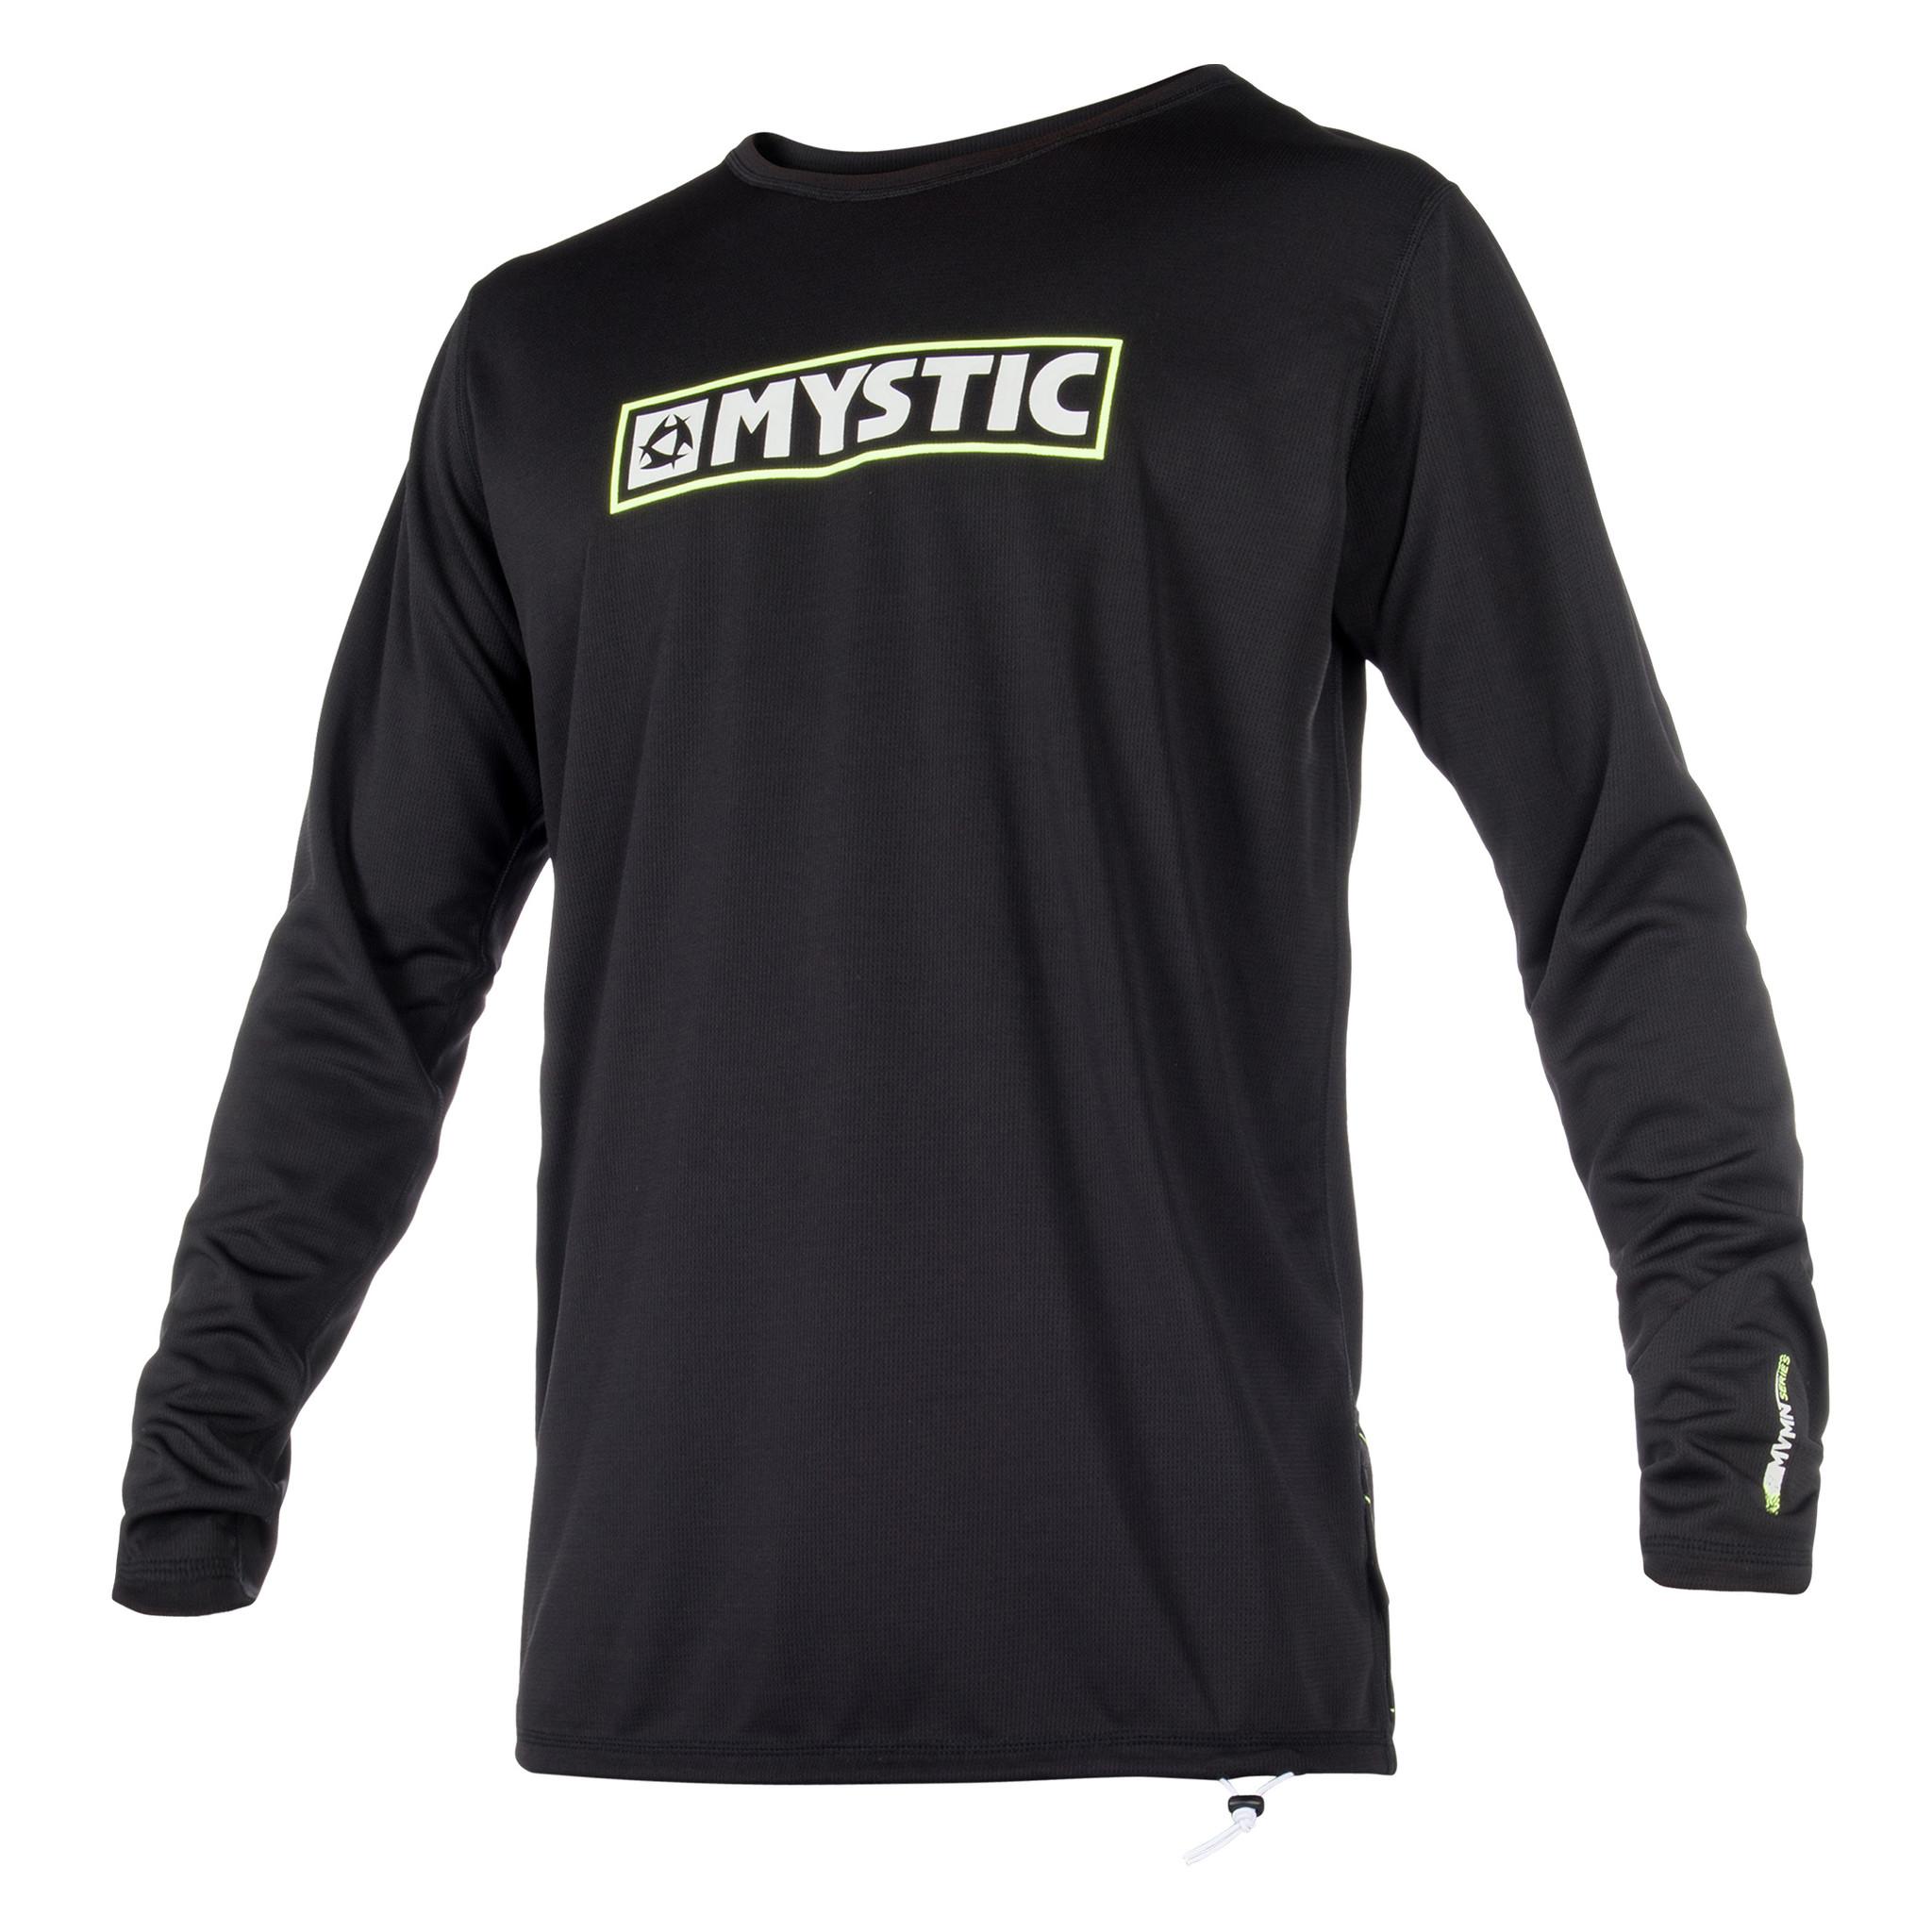 Mystic Mystic SUP Quickdry vest longsleeve